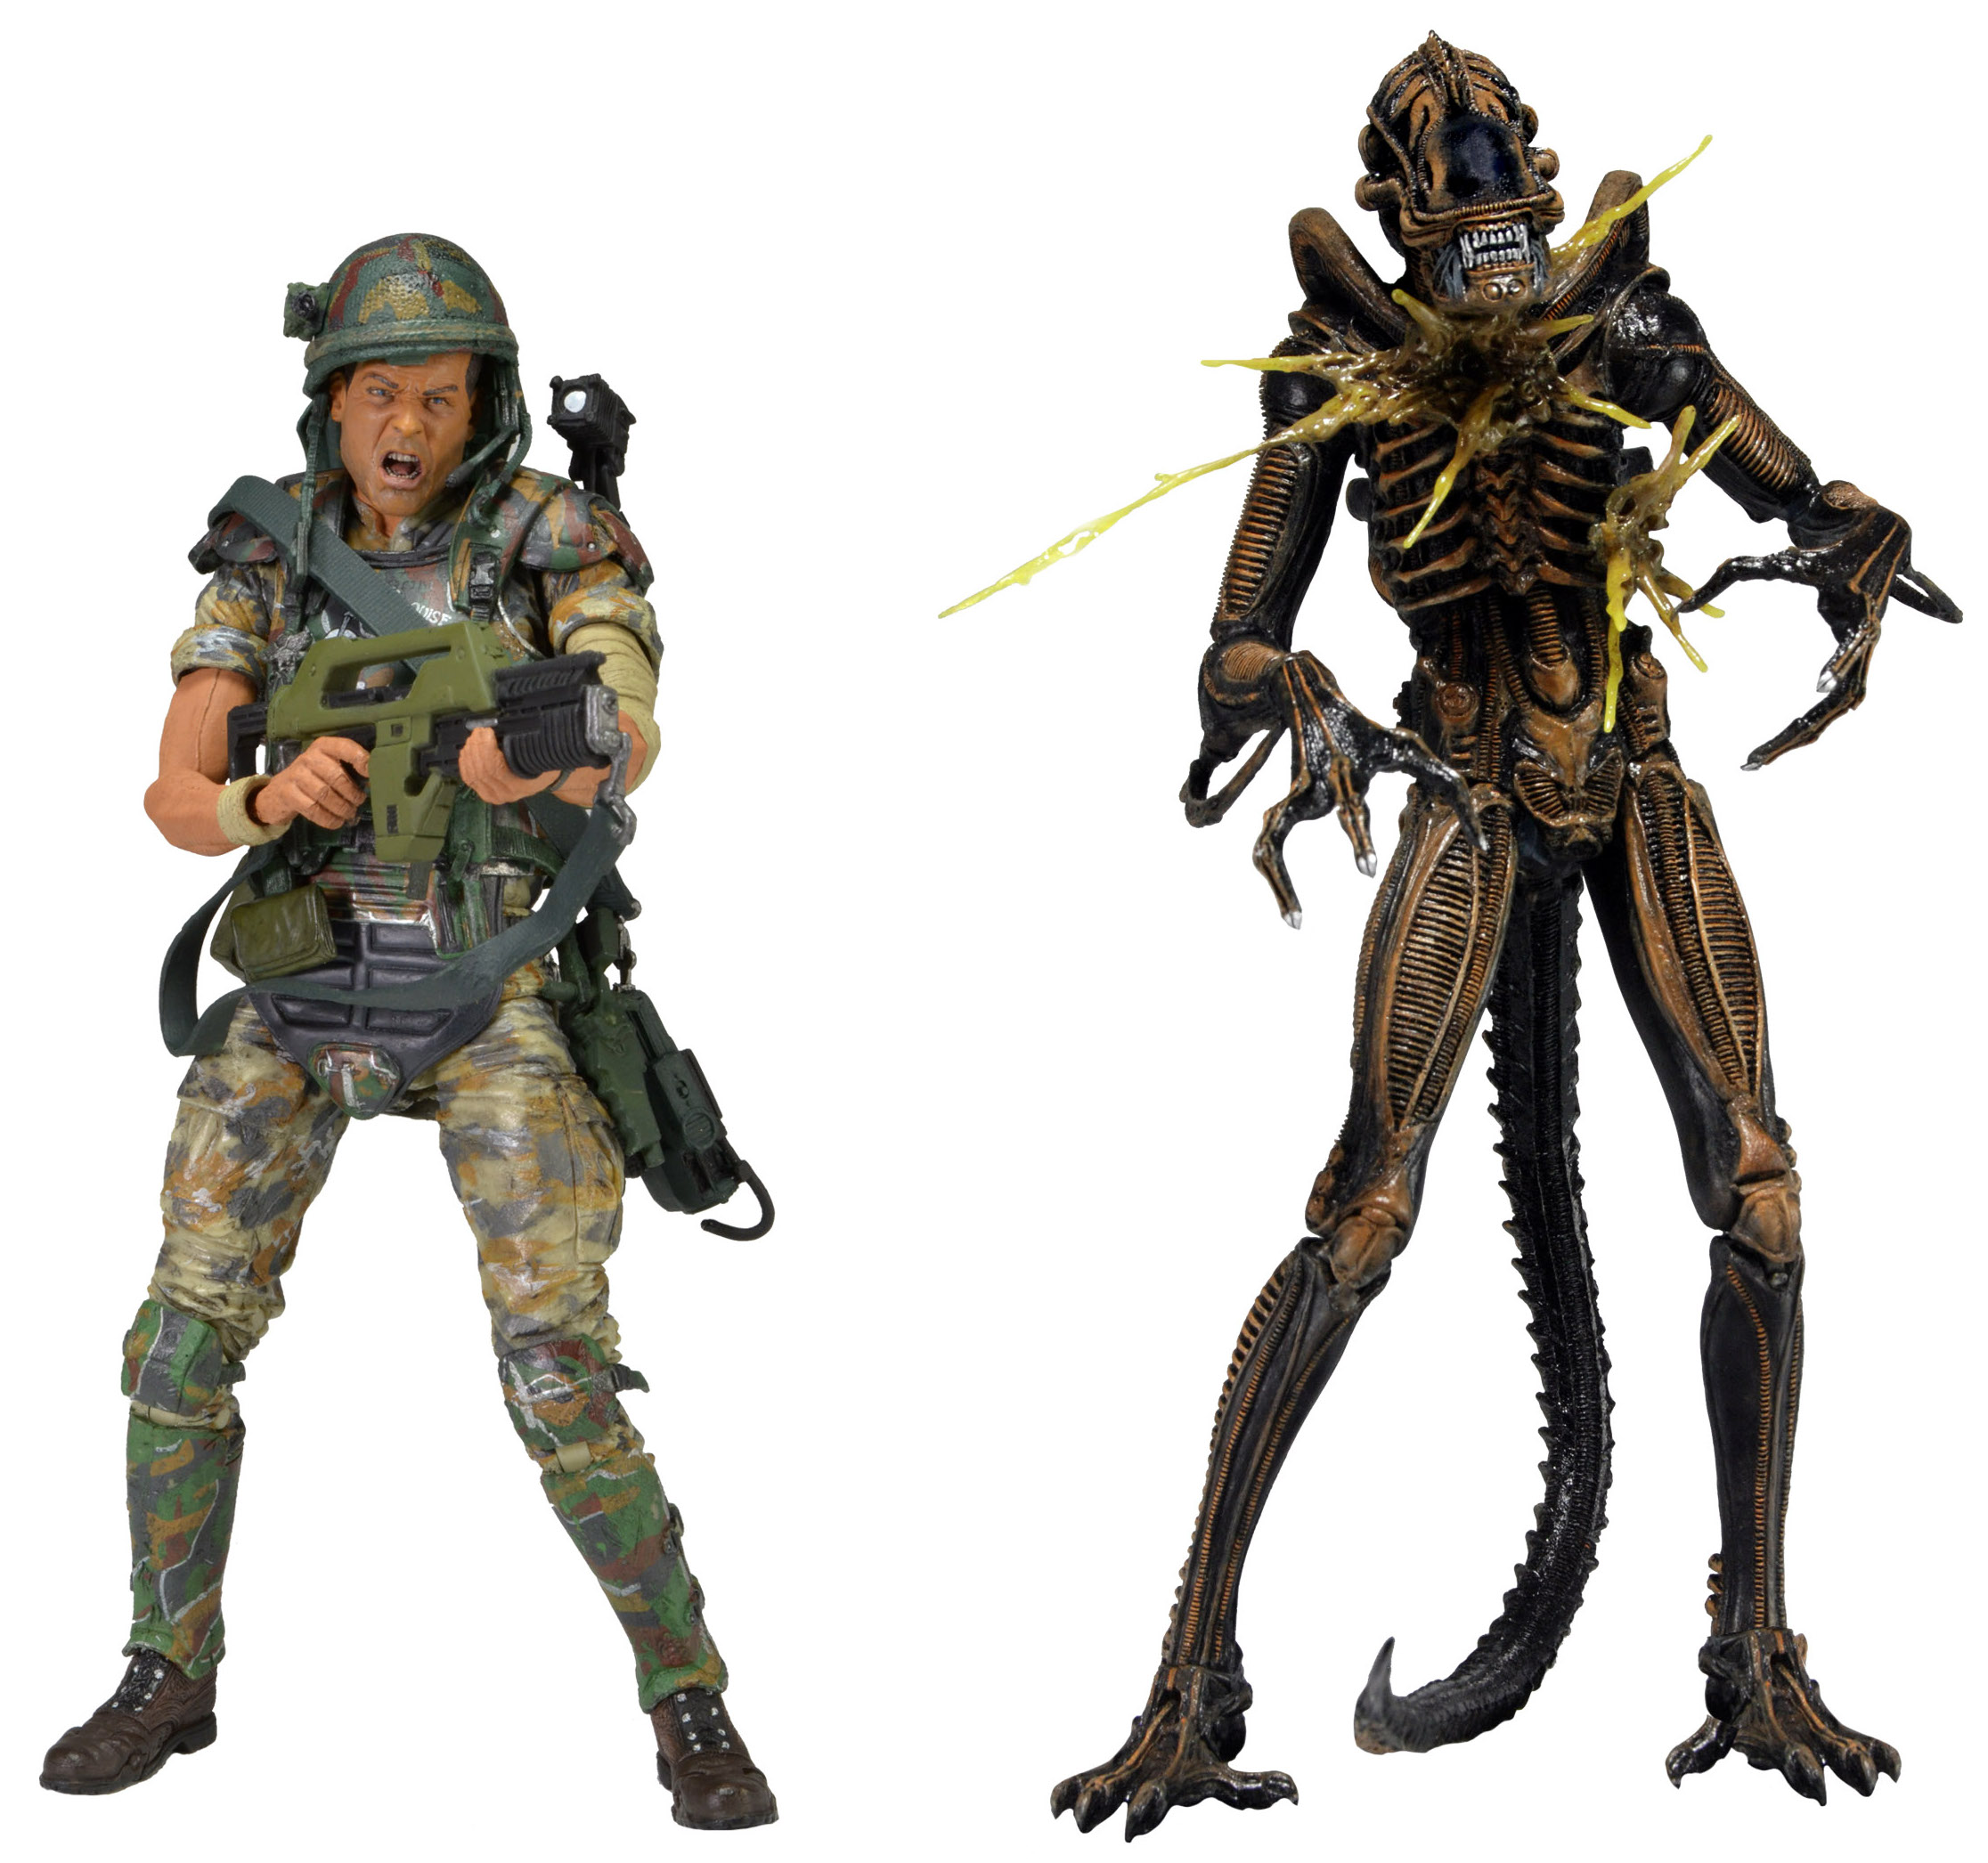 Aliens Hudson vs Brown Warrior 7in Action Figure 2pk by